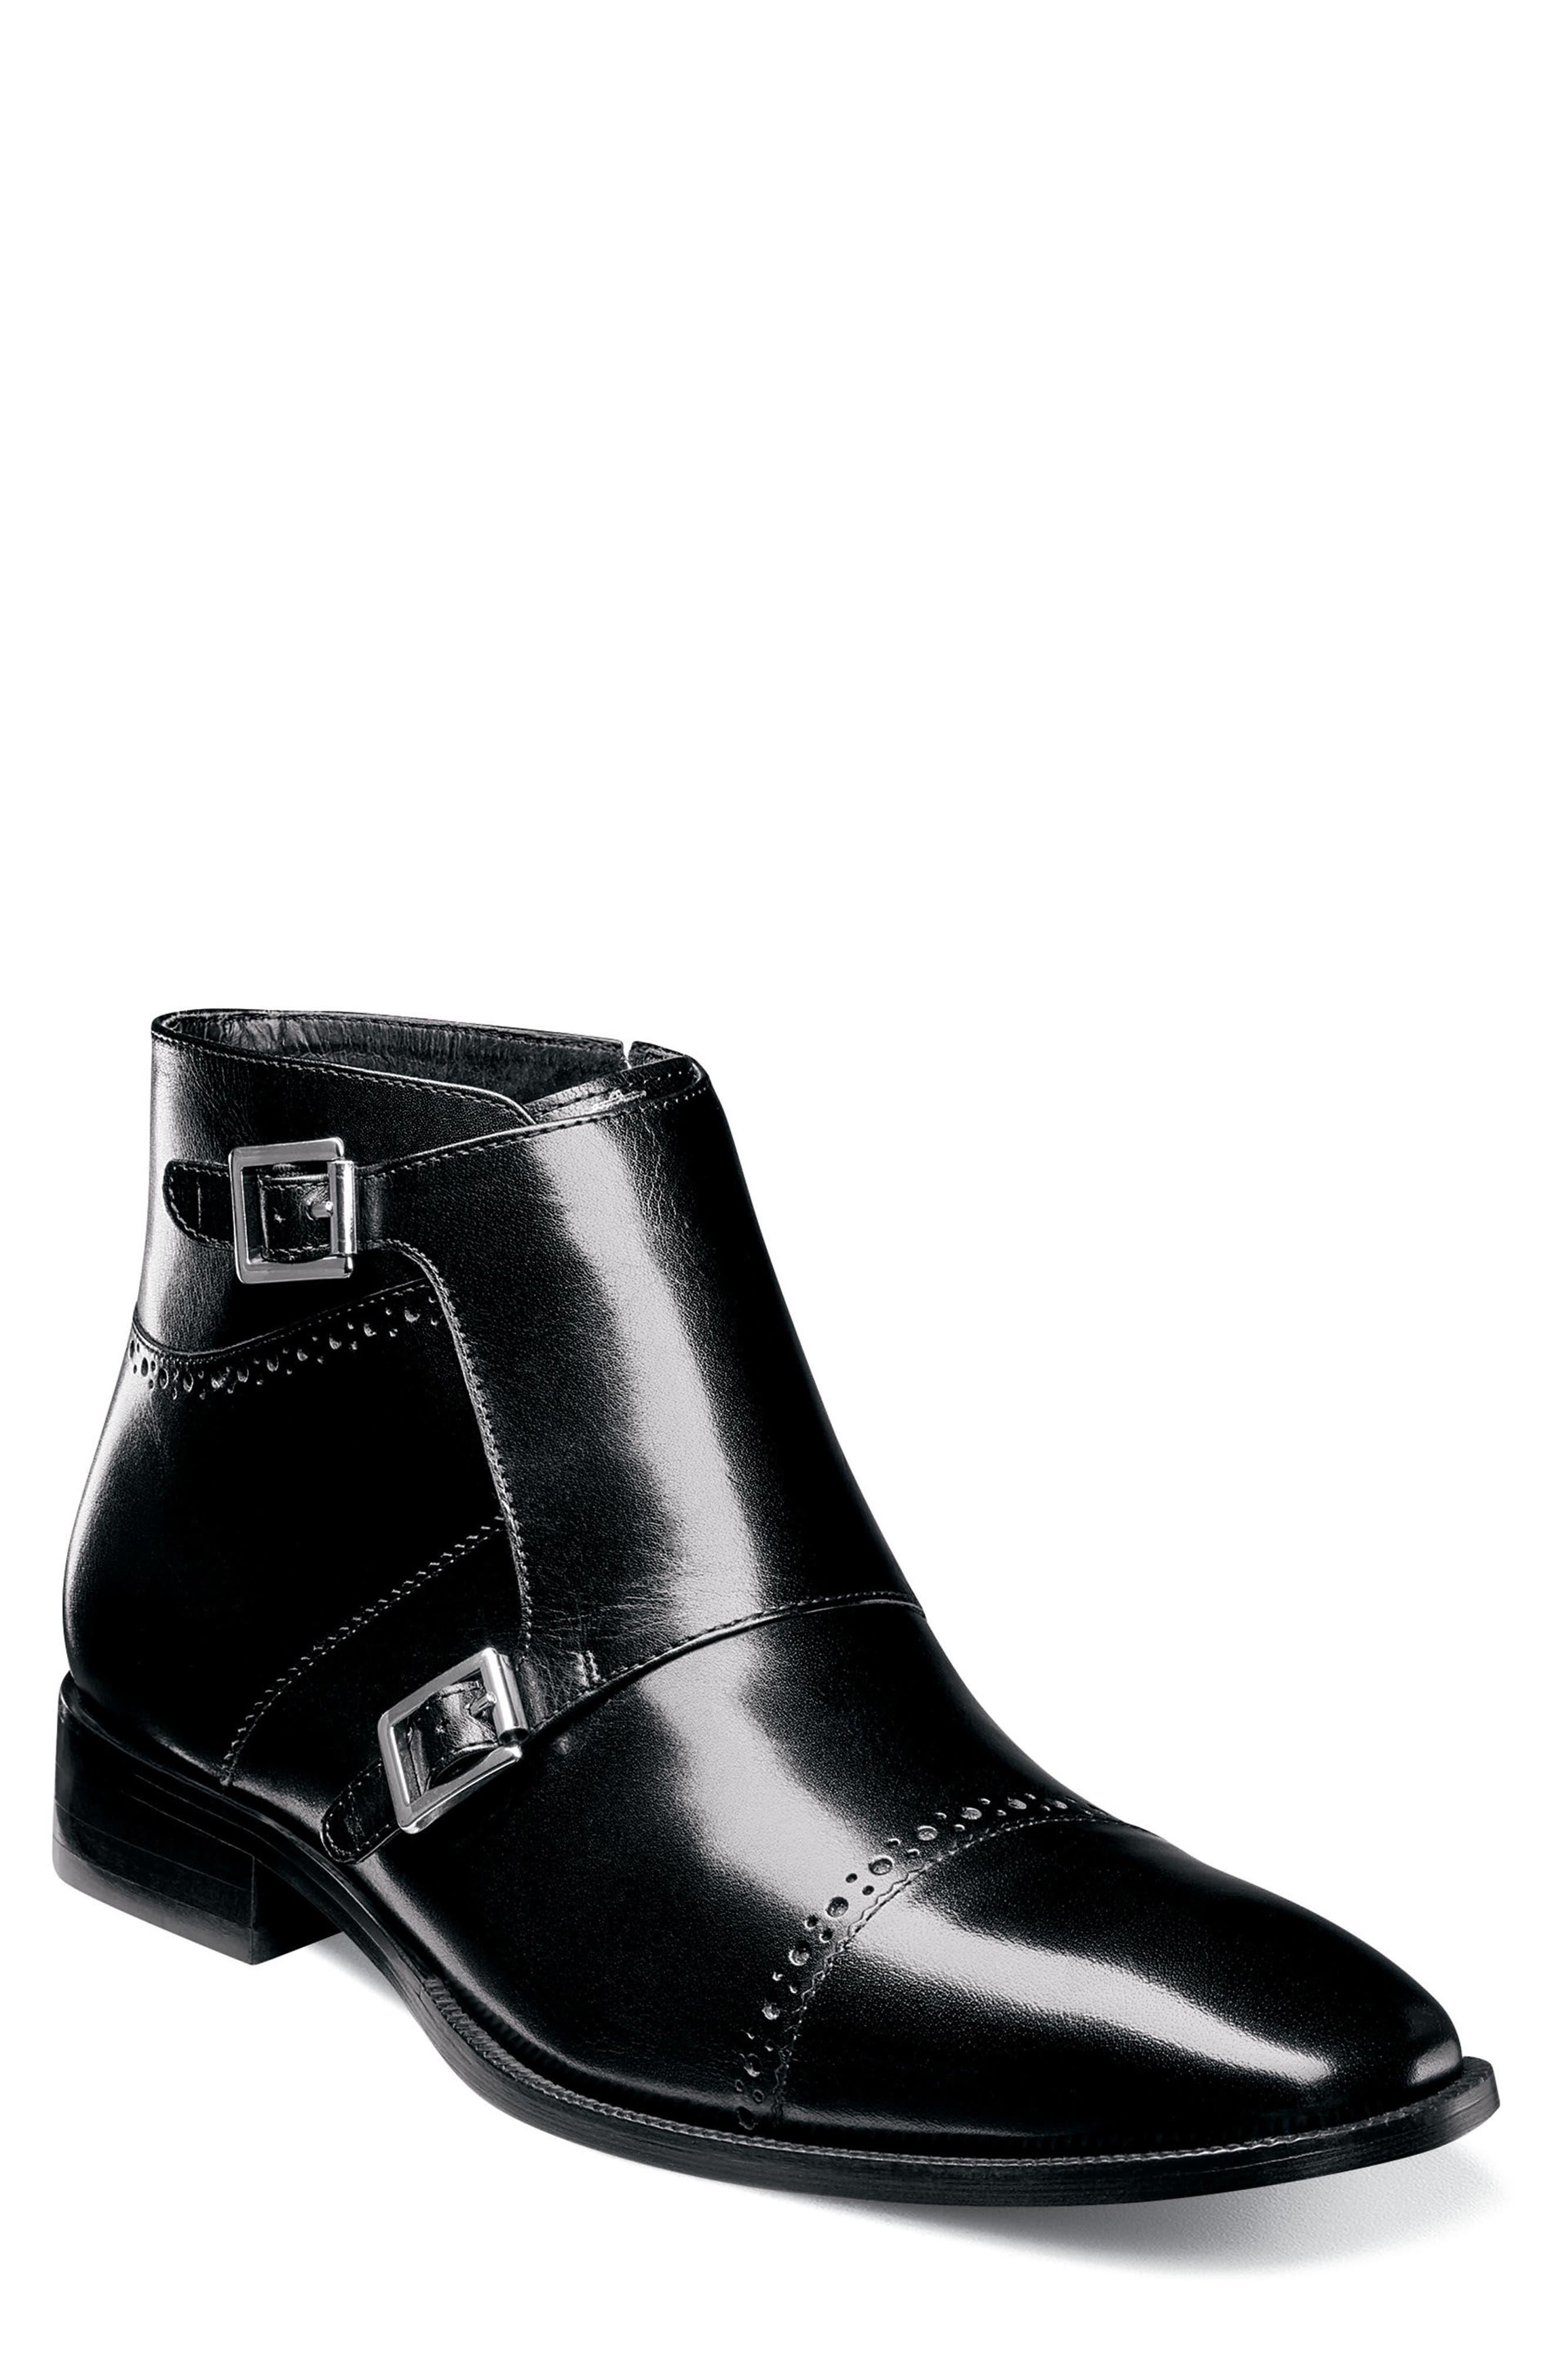 Kason Double Monk Strap Boot,                             Main thumbnail 1, color,                             001